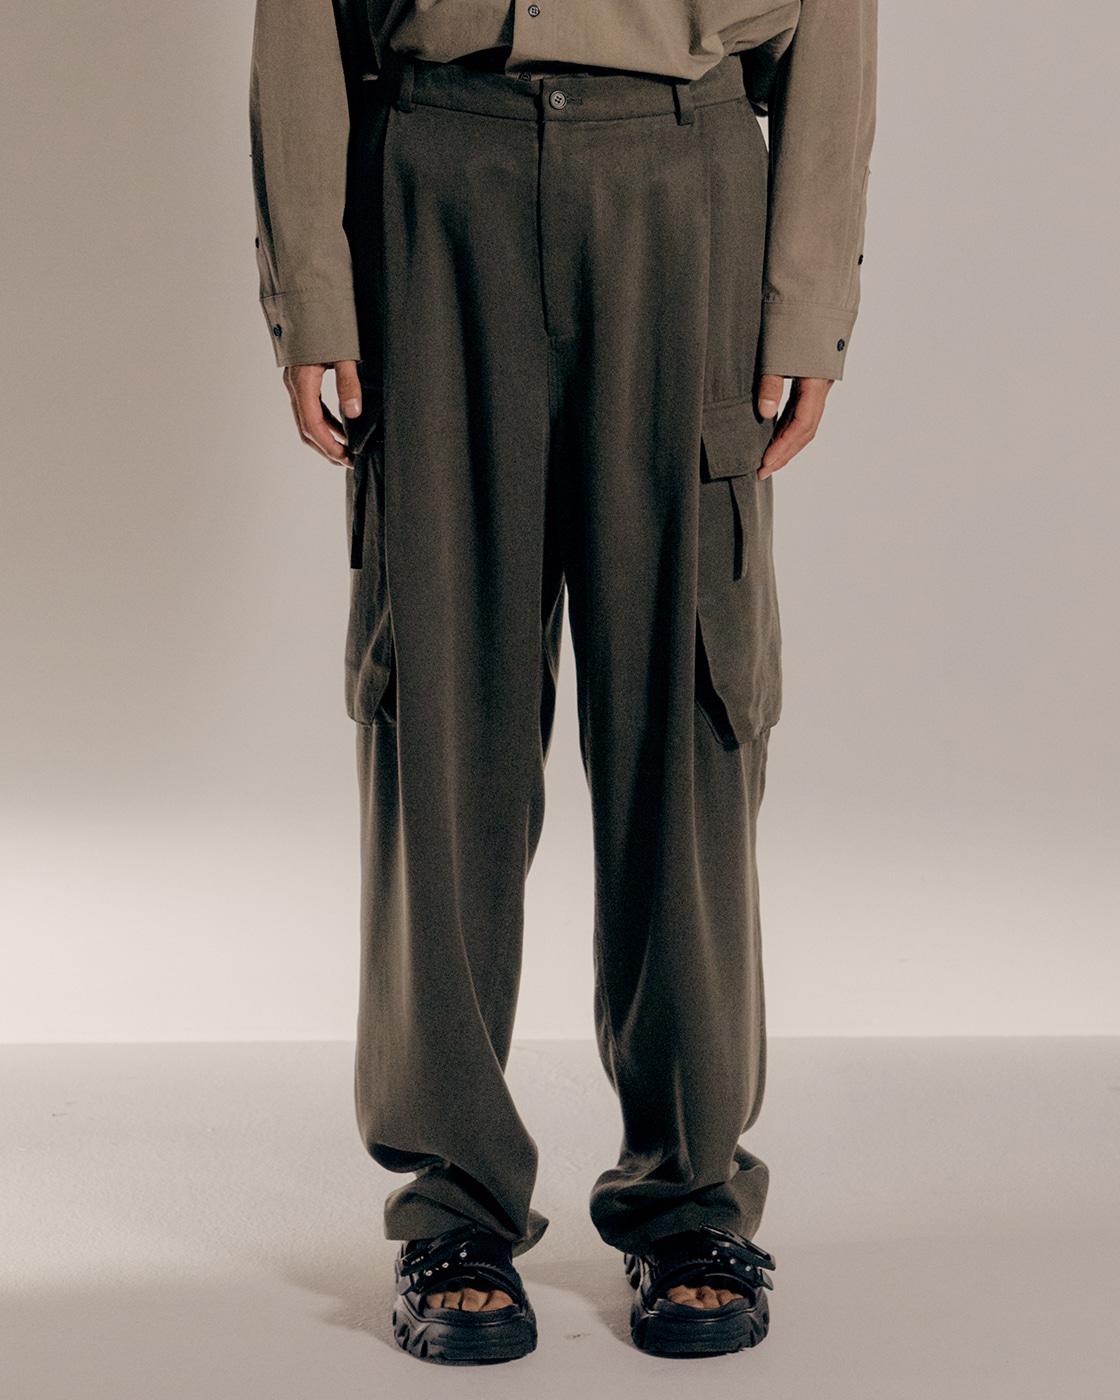 Khaki Loose Cargo Pants